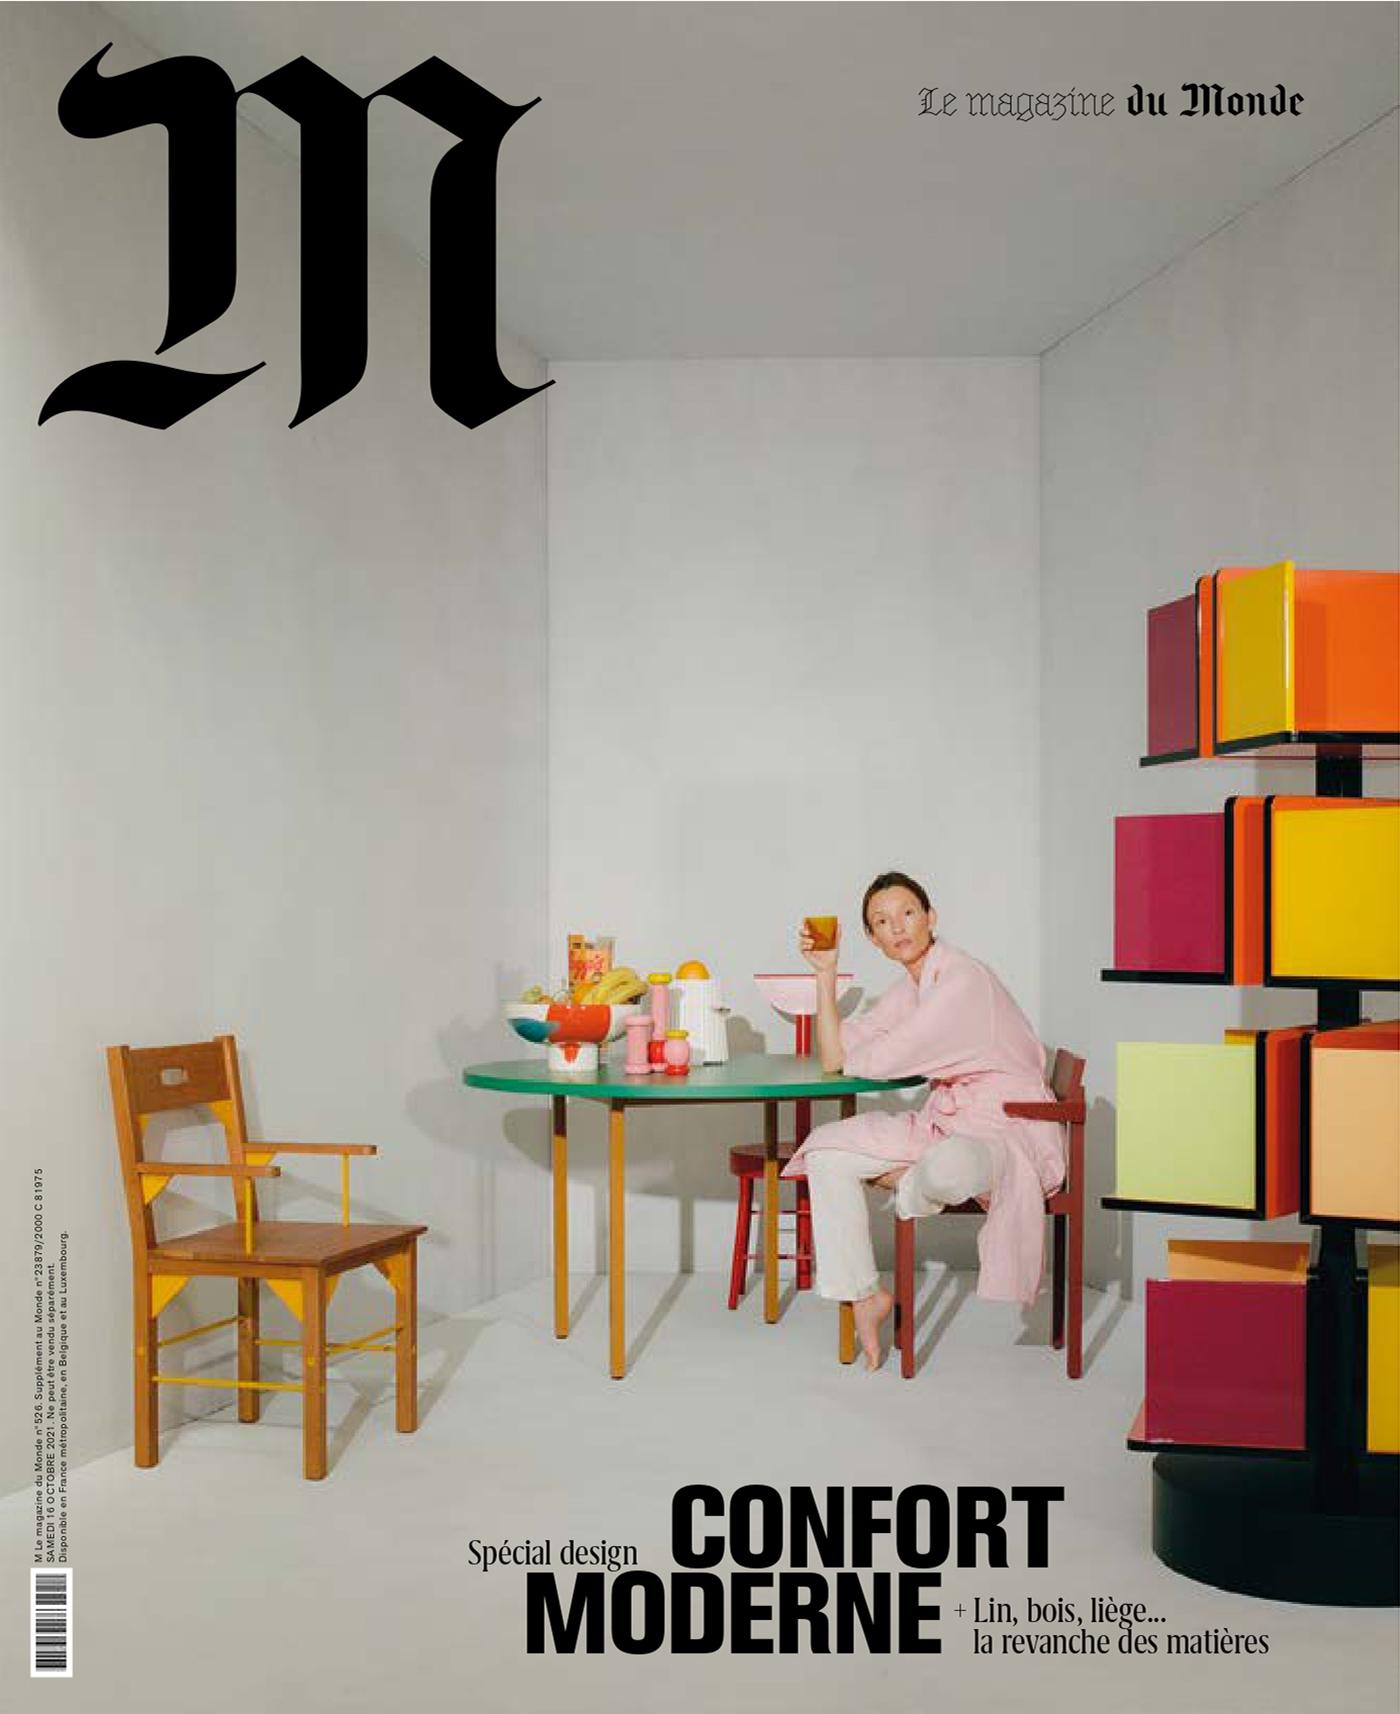 Audrey Marnay covers M Le magazine du Monde October 16th, 2021 by Julien T. Hamon